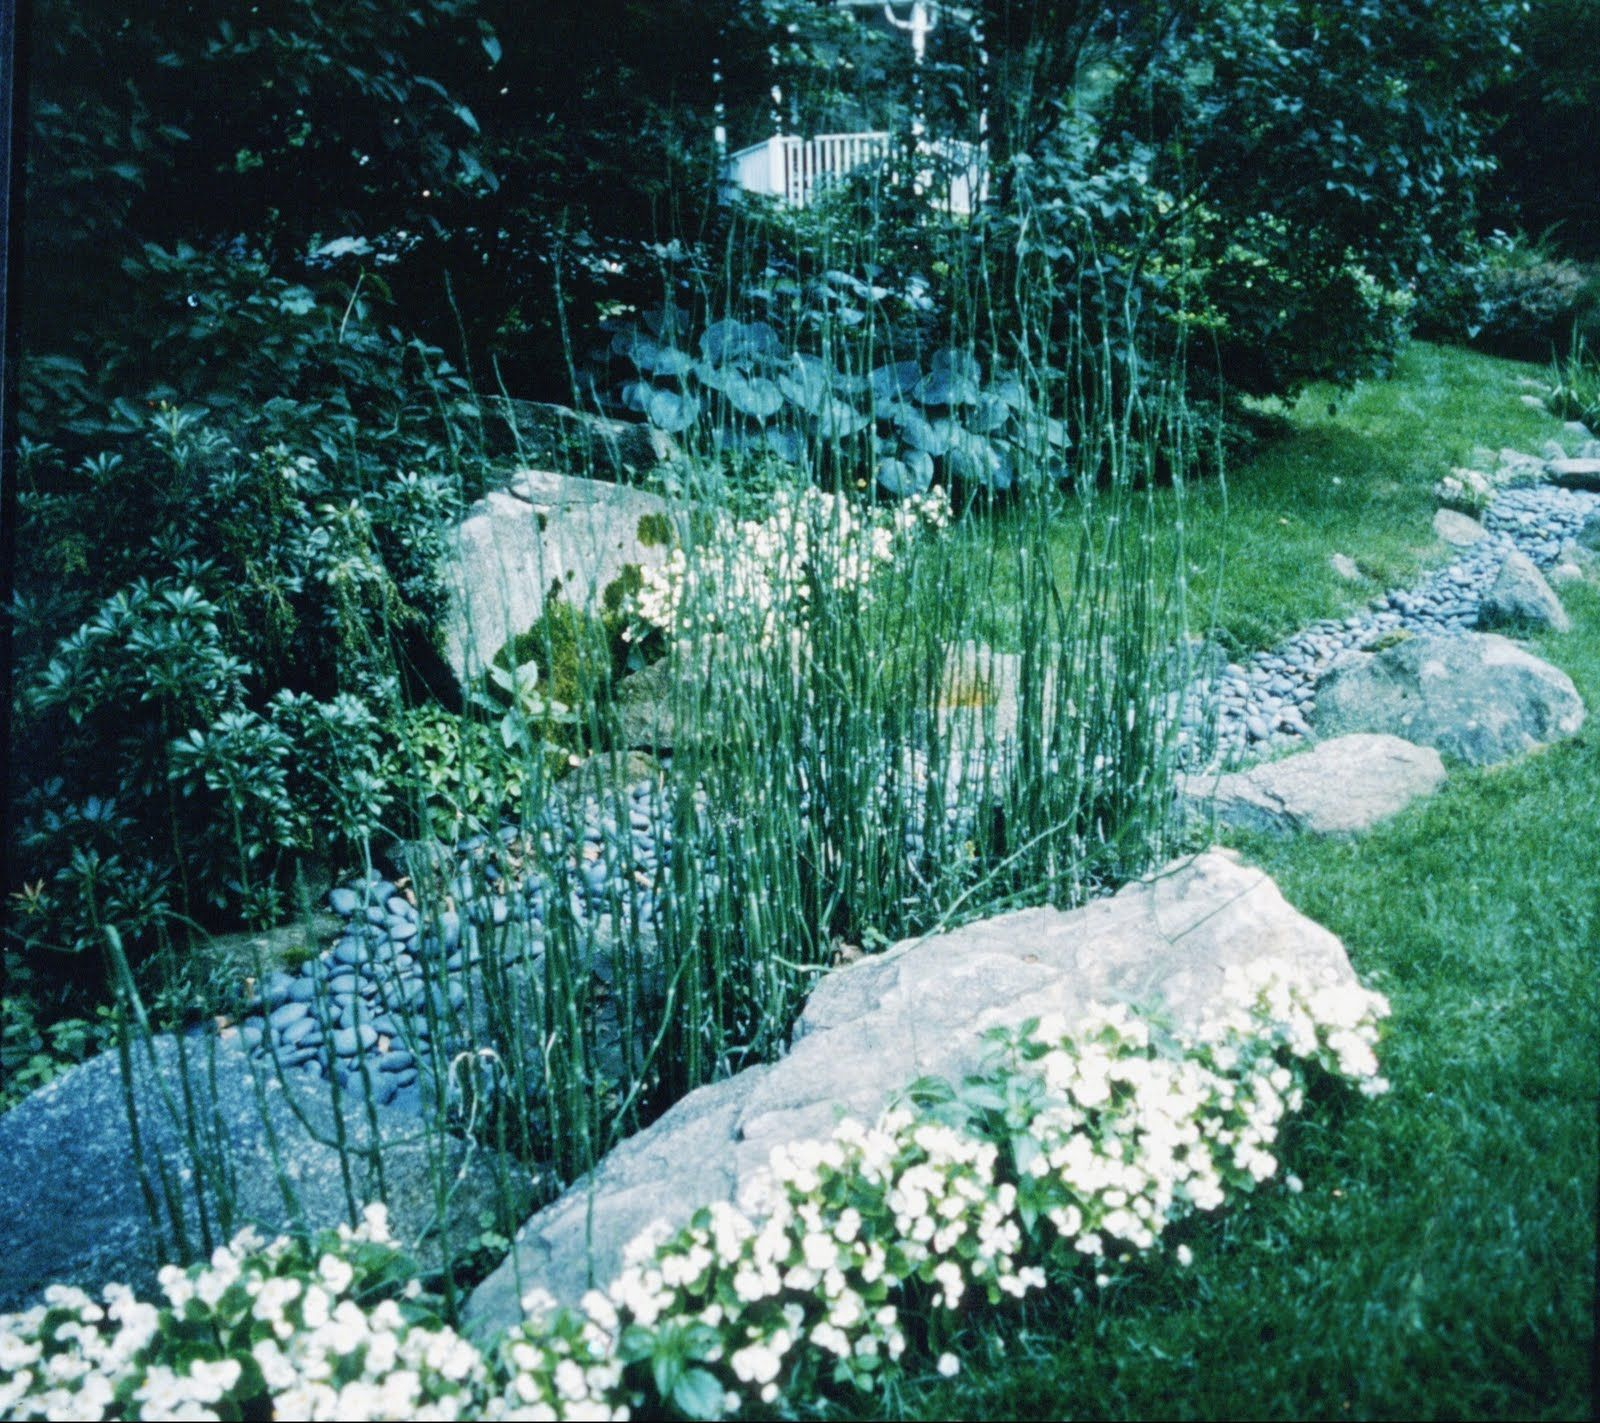 for dry bed | Garden Plant Combinations/Layout | Pinterest ... Planting Design Gardens Dry on planting a garden, drought tolerant landscape design, modern planting design,